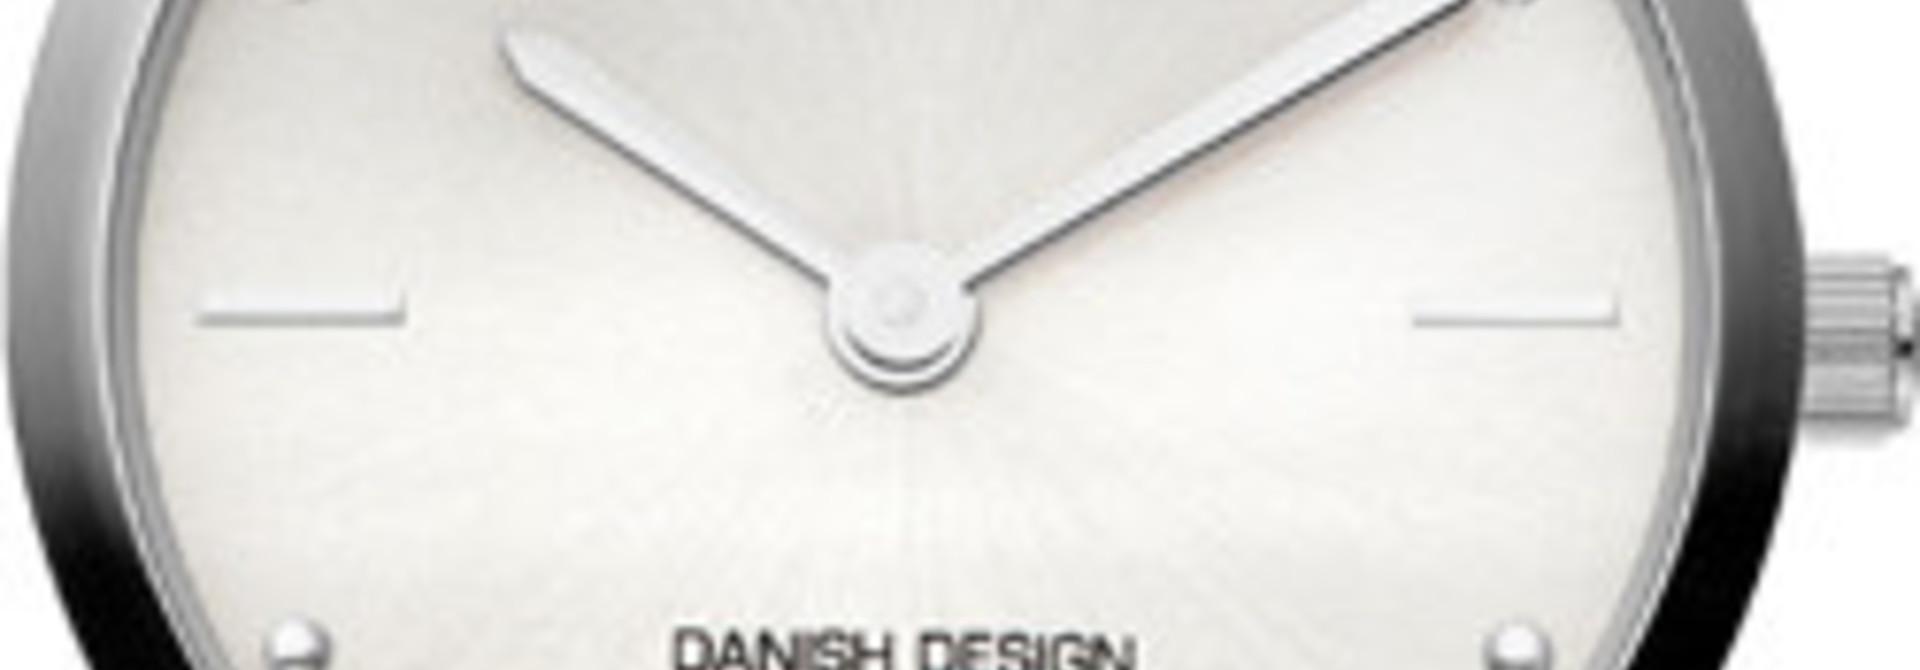 Danish Design Stainless Steel Watch Iv62Q1140,